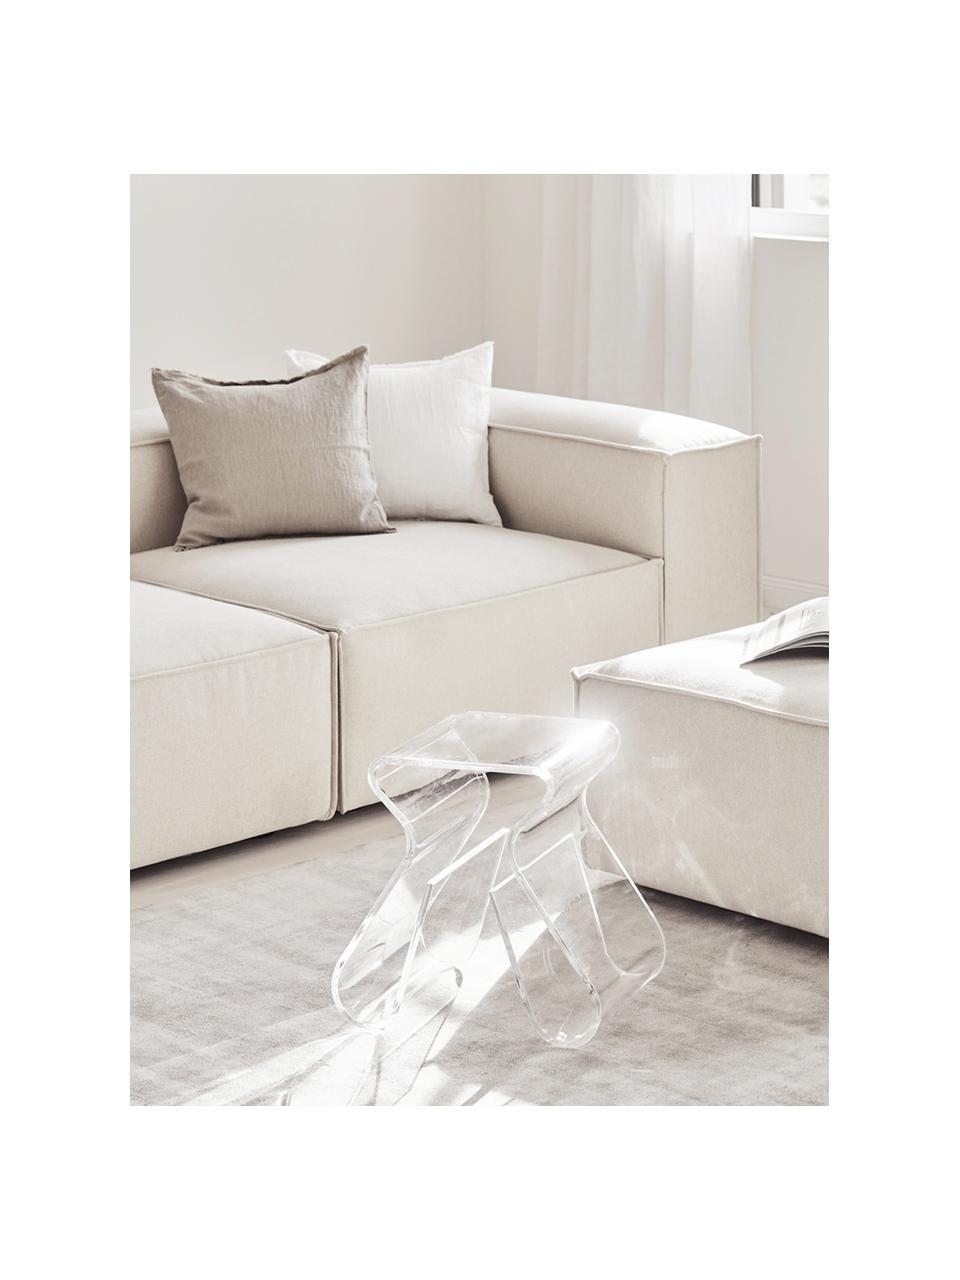 Modulaire chaise longue Lennon in beige, Bekleding: polyester De hoogwaardige, Frame: massief grenenhout, multi, Poten: kunststof De poten bevind, Geweven stof beige, B 269 x D 119 cm